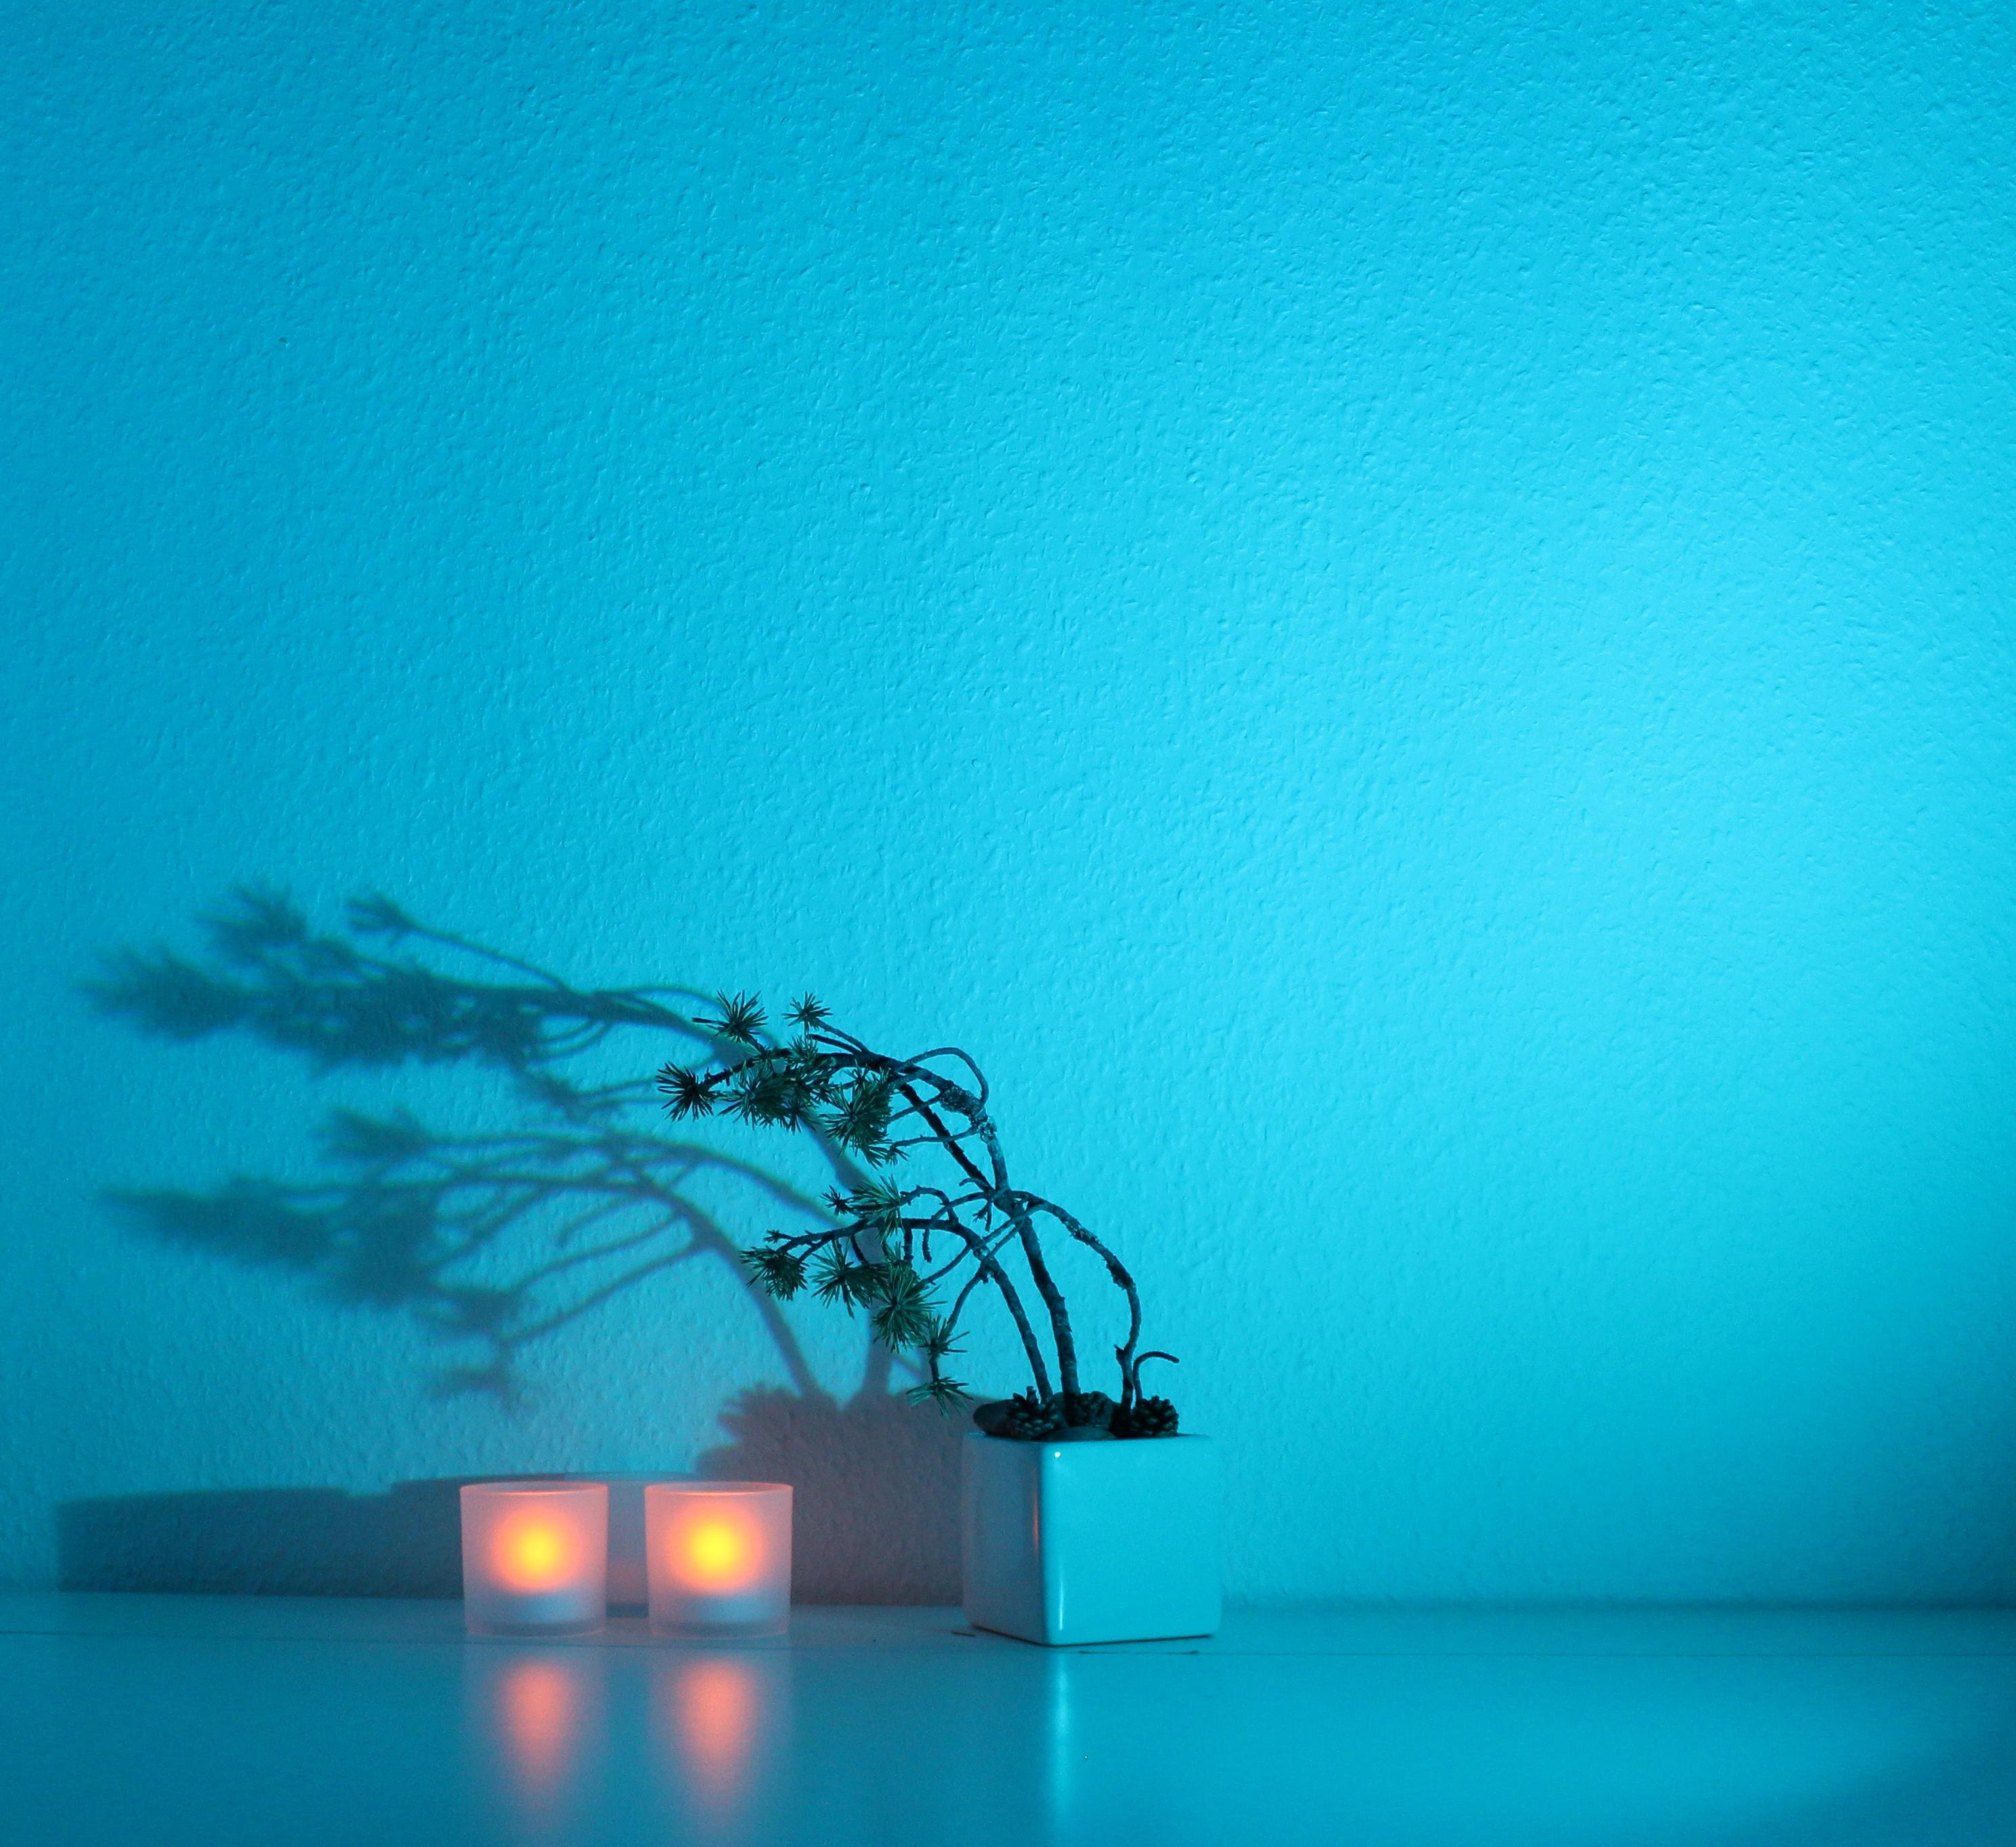 My light composition